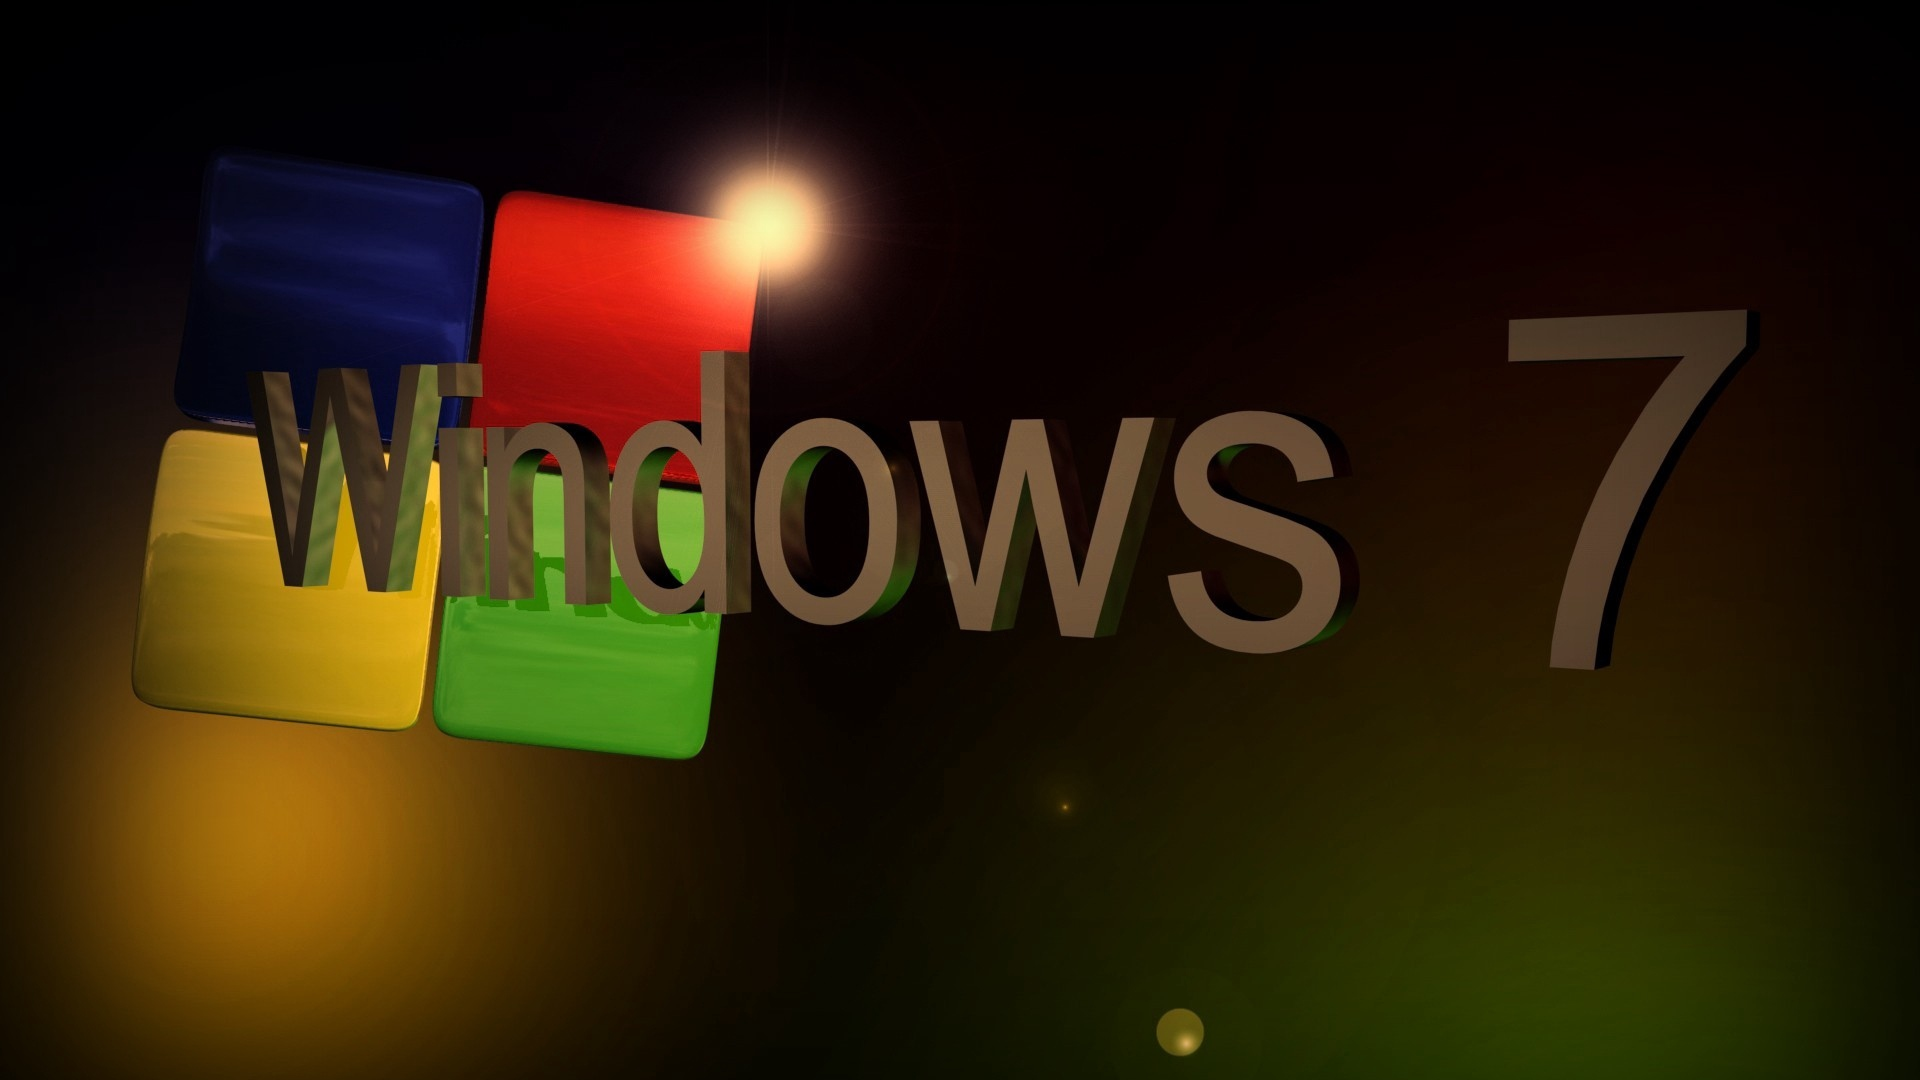 Windows 7 Wallpaper 64 1920x1080